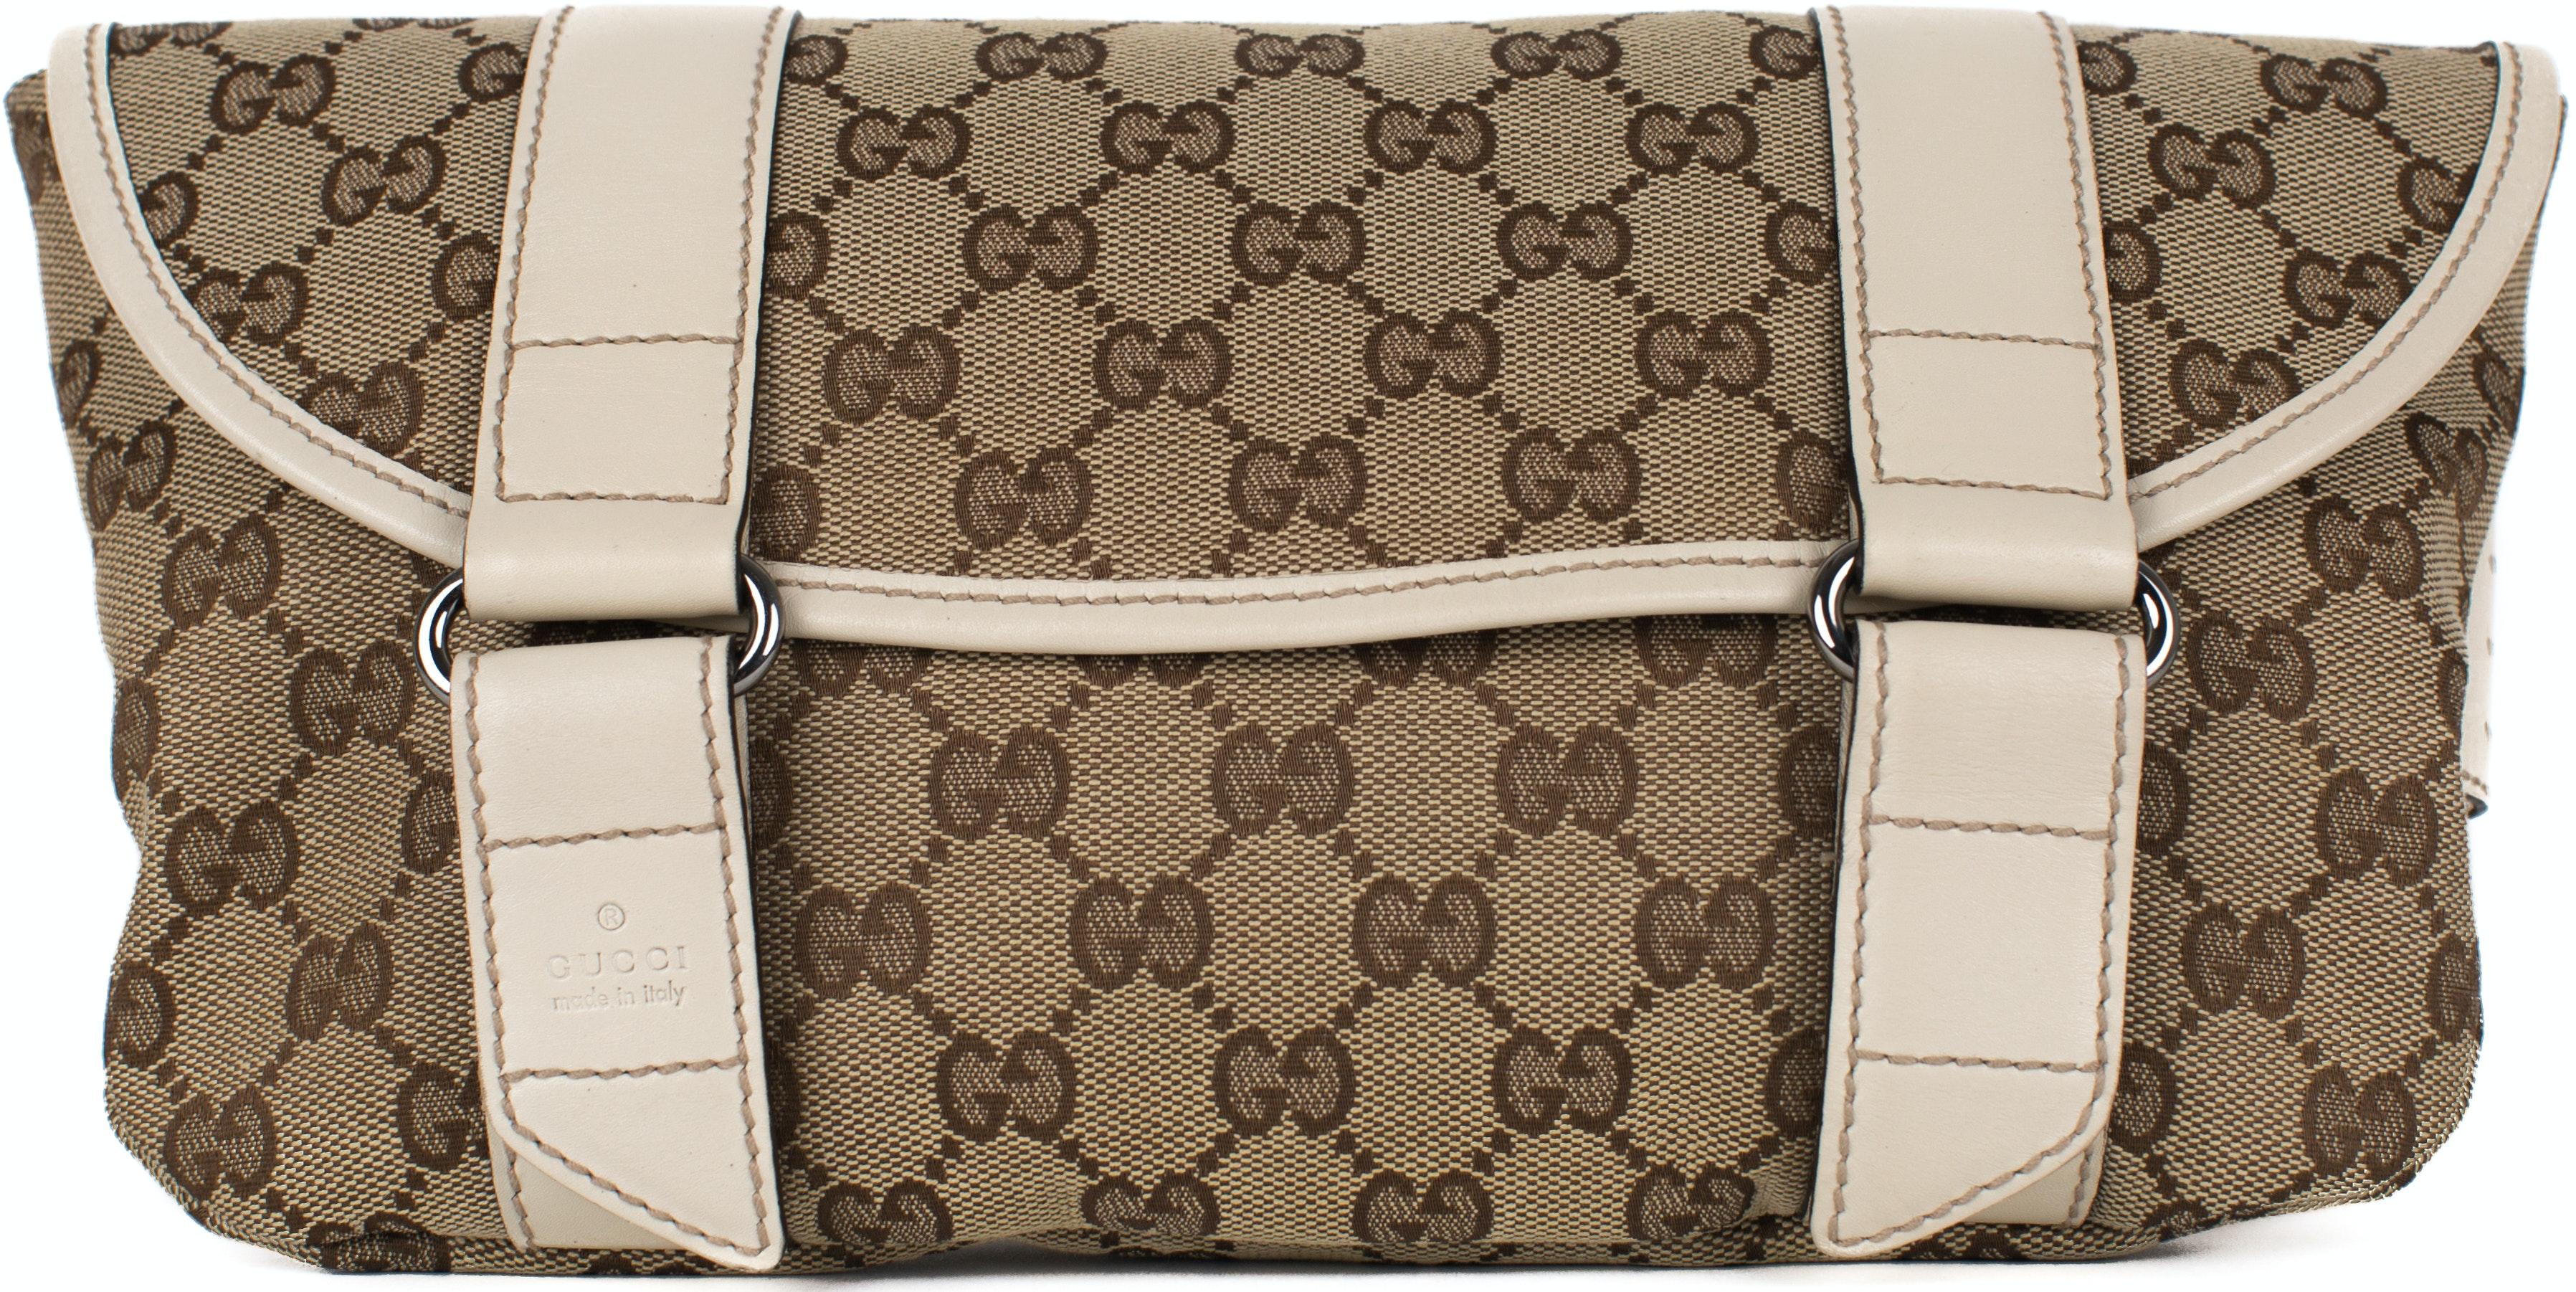 Gucci Waist Bag GG Canvas